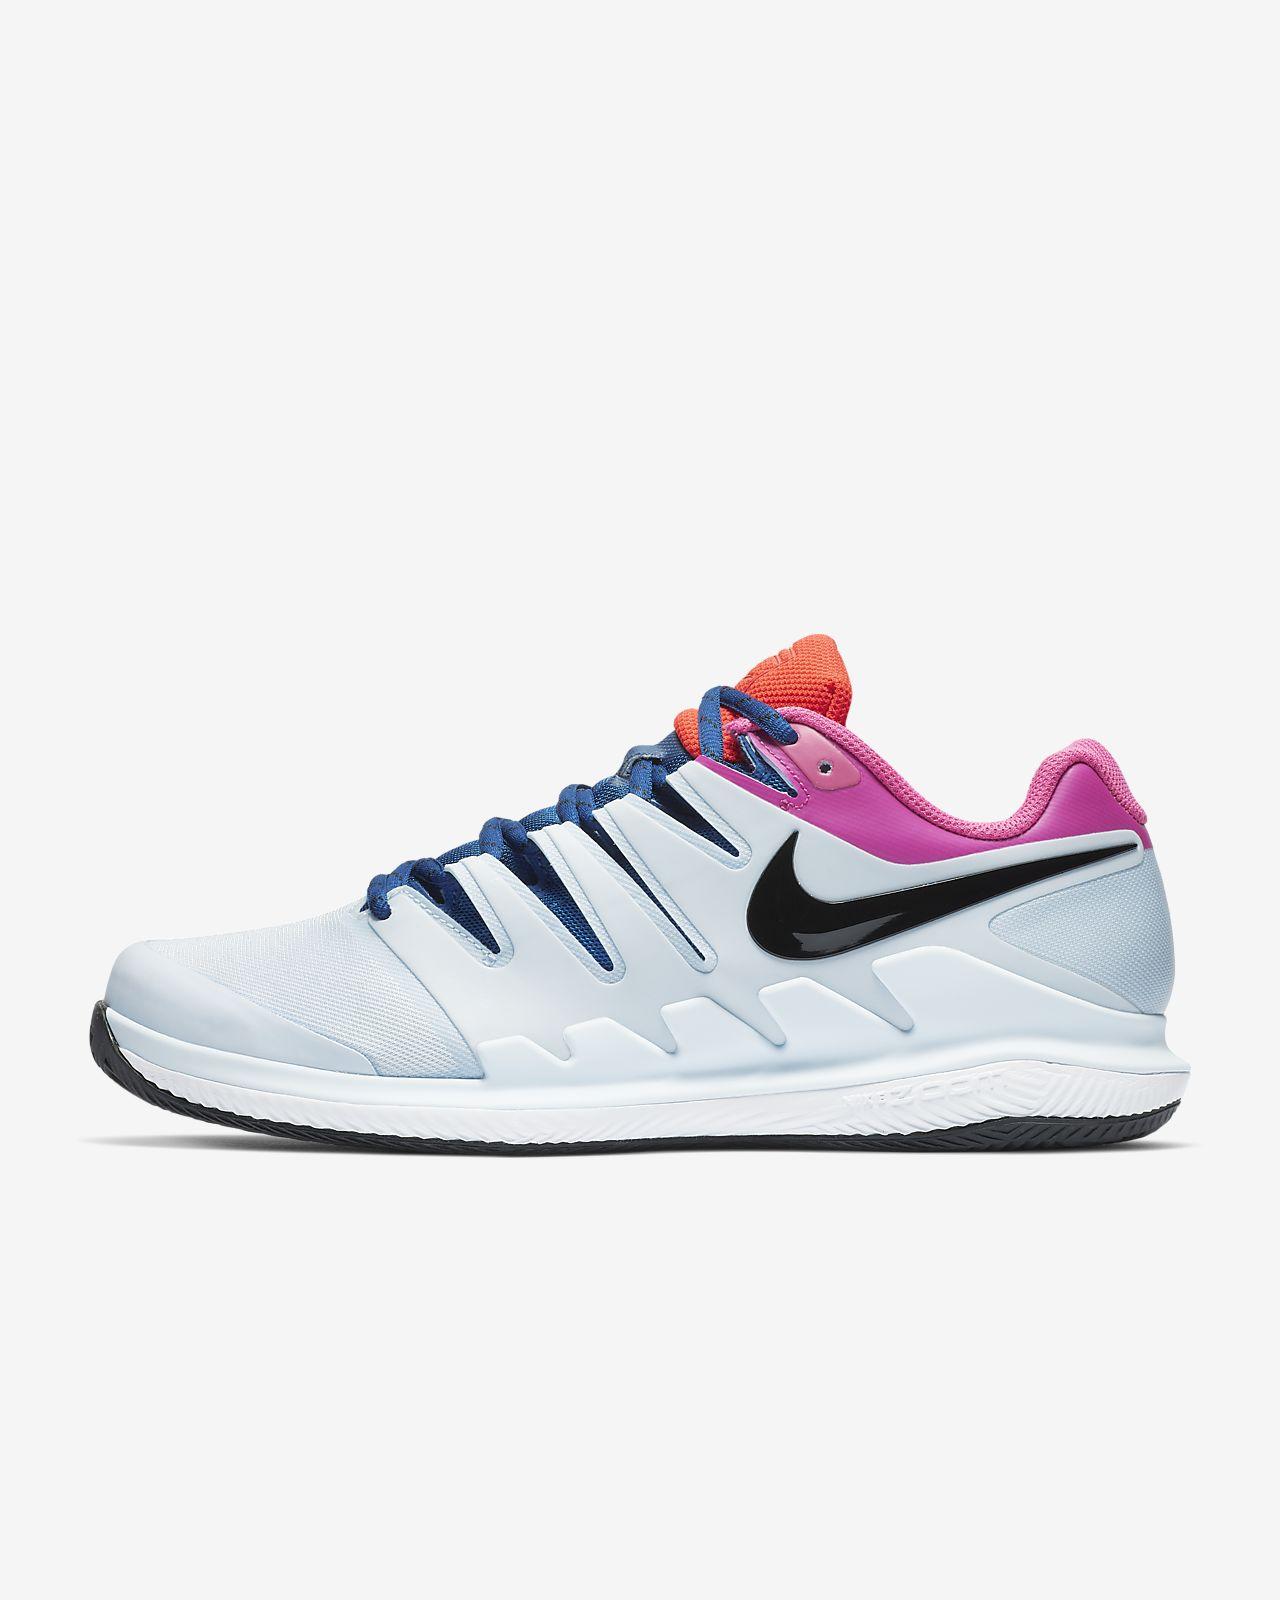 brand new 0c58e f499e ... Chaussure de tennis Nike Air Zoom Vapor X Clay pour Homme